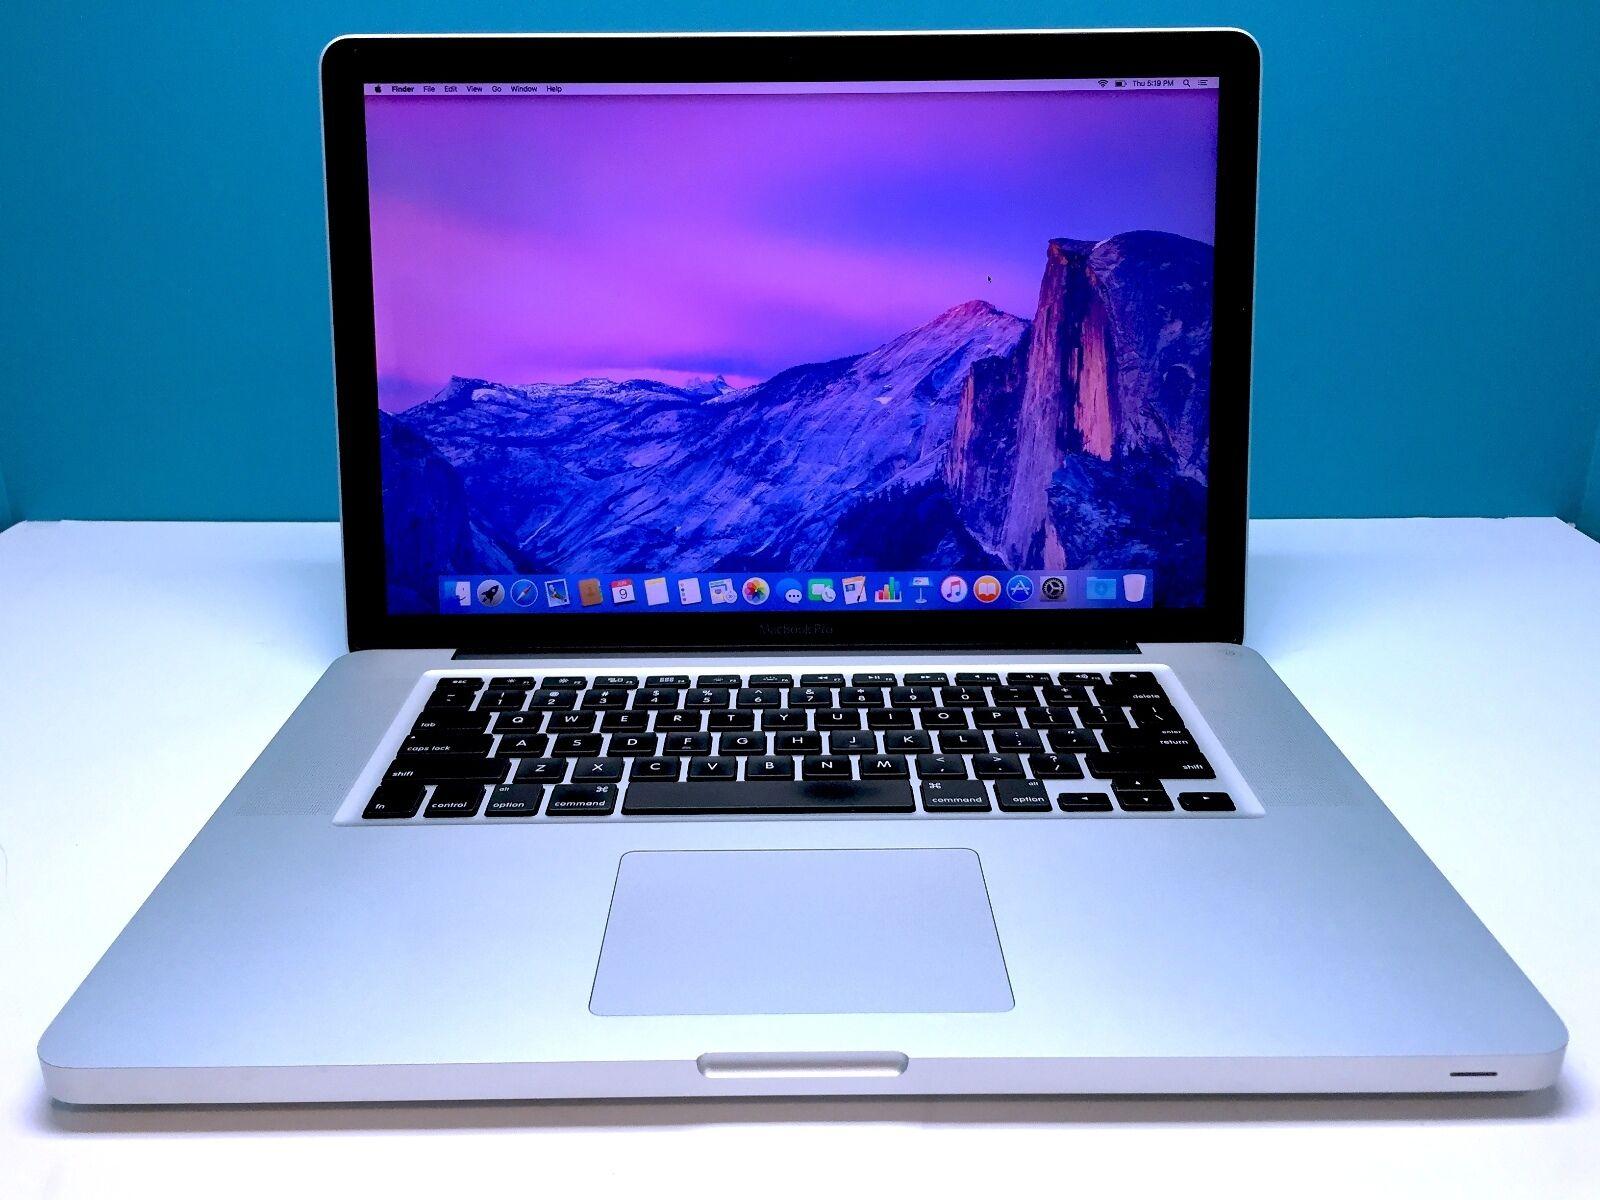 15 macbook pro apple laptop core i5 2 4ghz 8gb 1tb. Black Bedroom Furniture Sets. Home Design Ideas